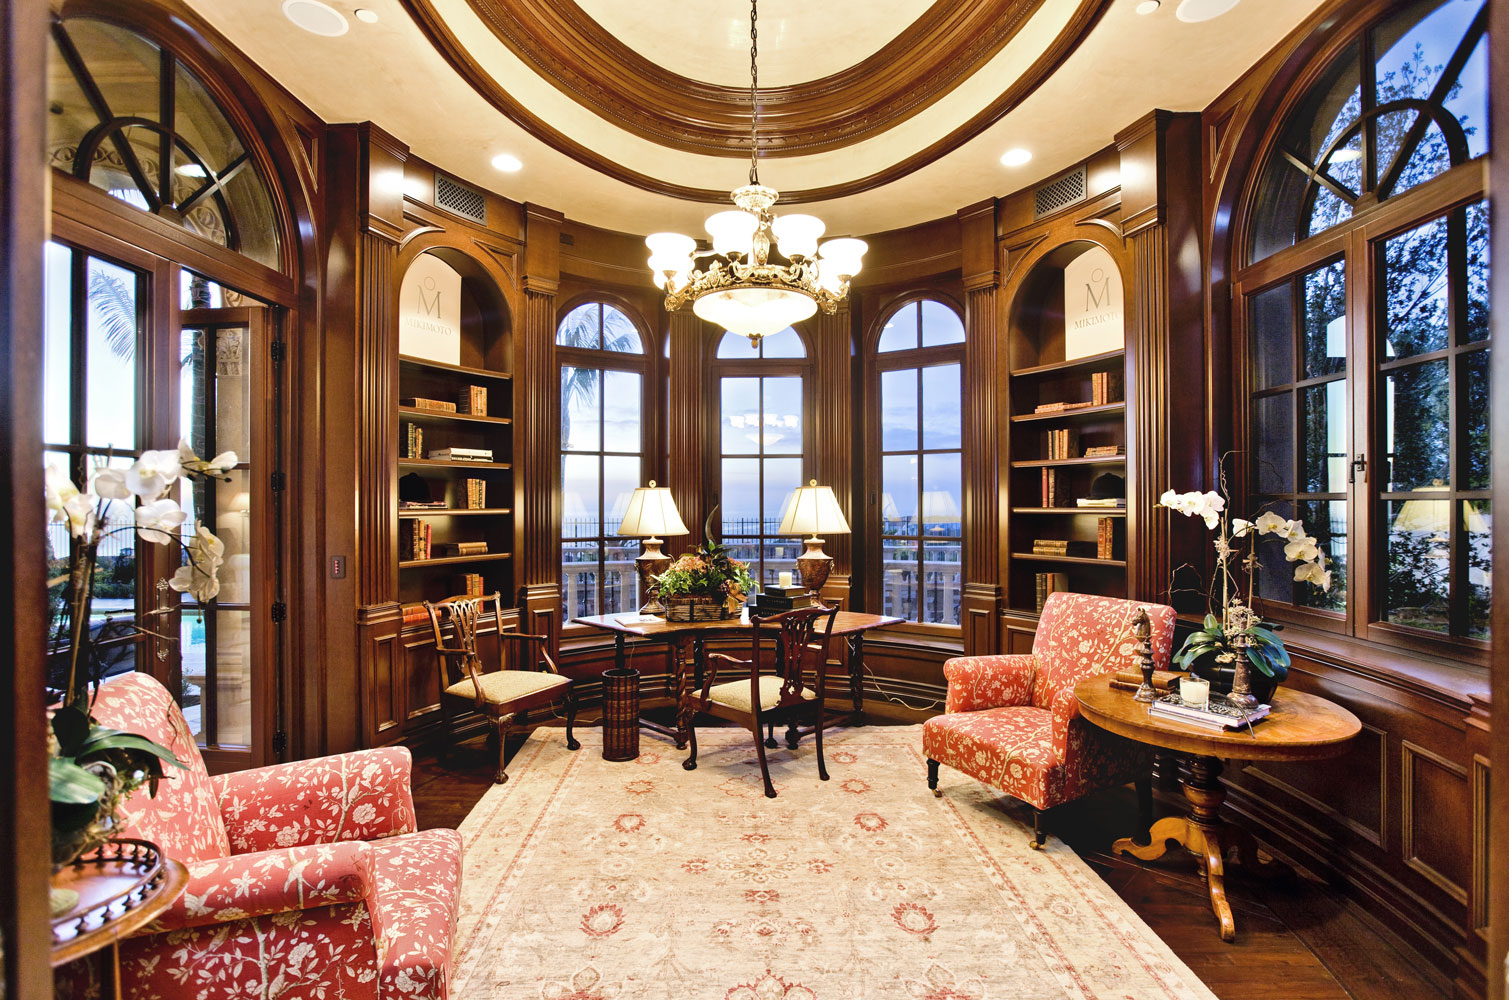 Traditional-Office-Rotunda-Wood-Paneling-Built-In-Shelves-Corbin-Reeves.jpg